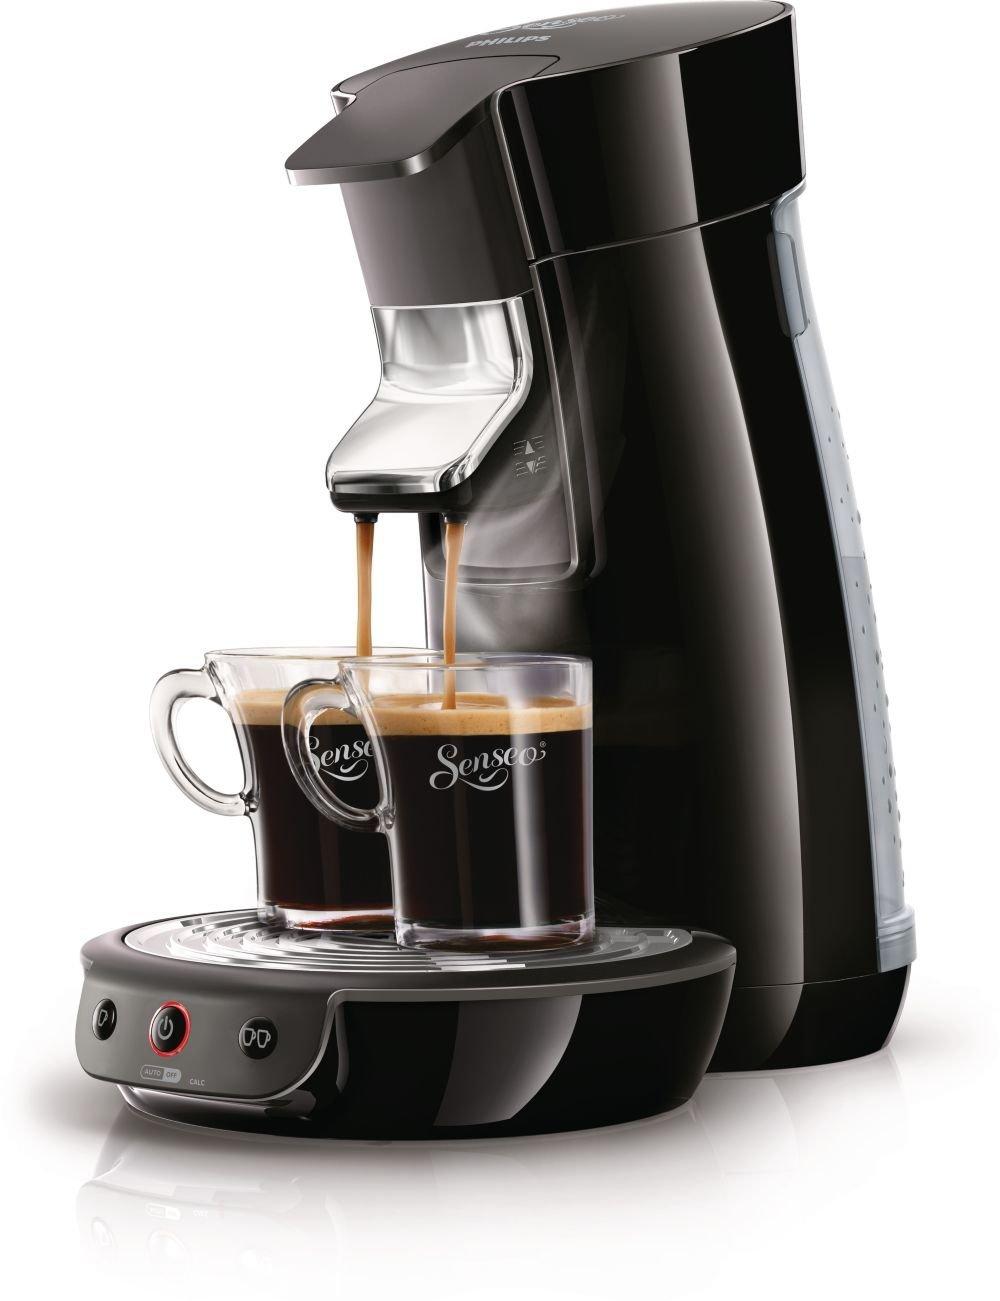 Comprar senseo viva cafe opiniones